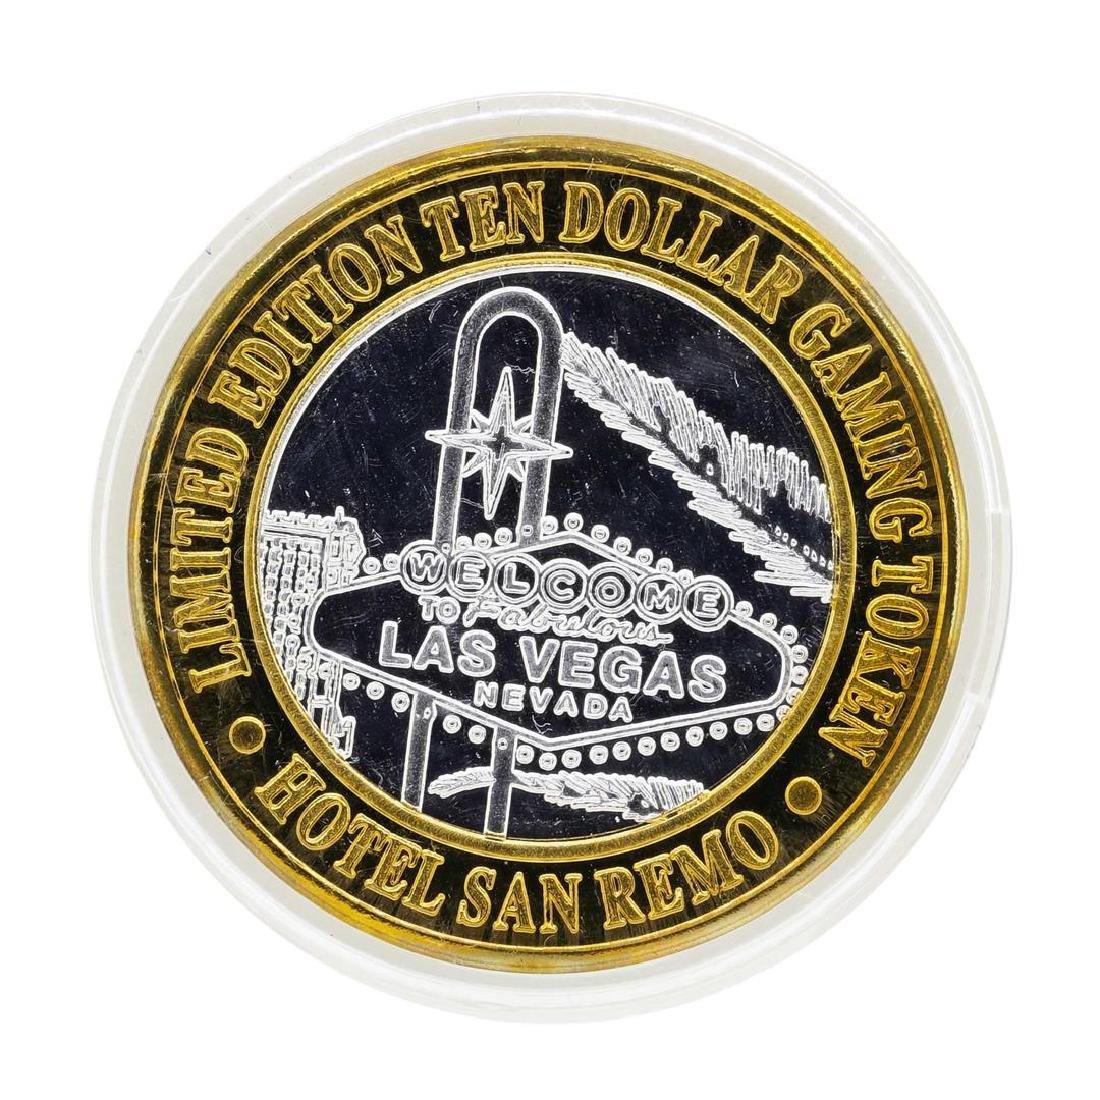 .999 Silver Hotel San Remo Las Vegas, Nevada $10 Casino